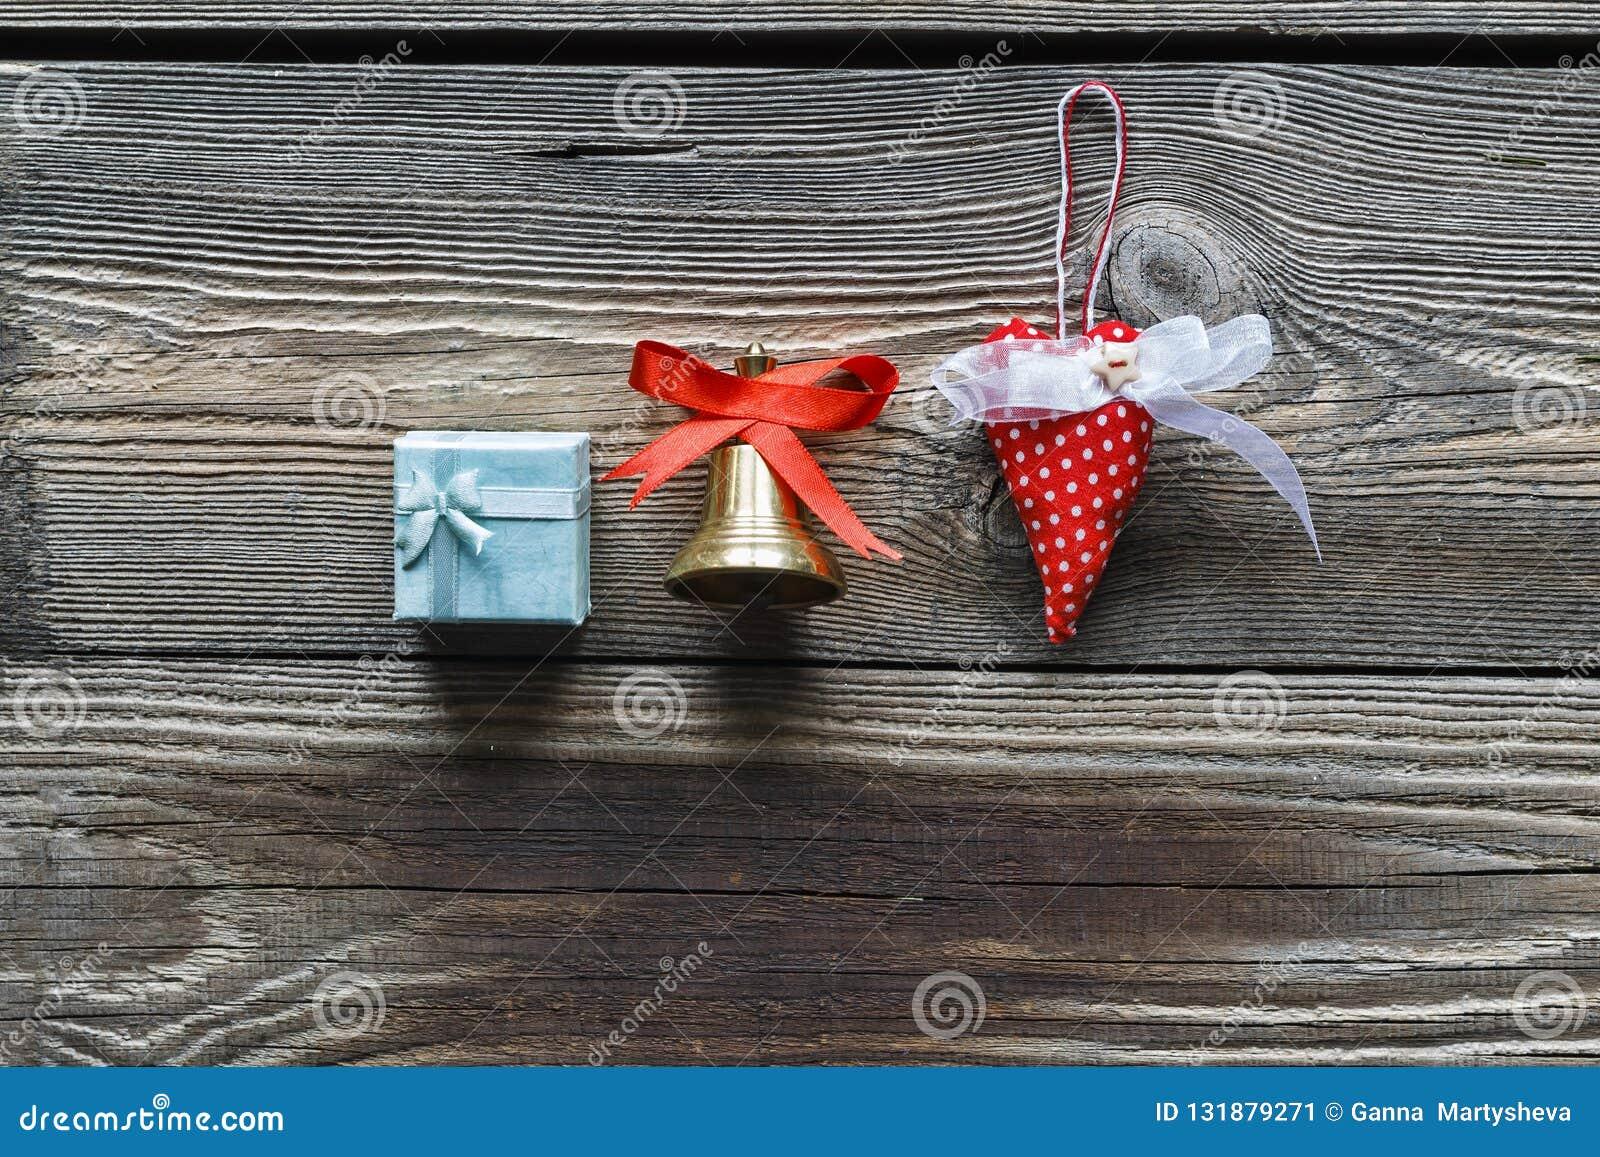 Newest Craft Ideas For Christmas 2020 Homemade Christmas Toys, Christmas Tree Decorations,2019,2020